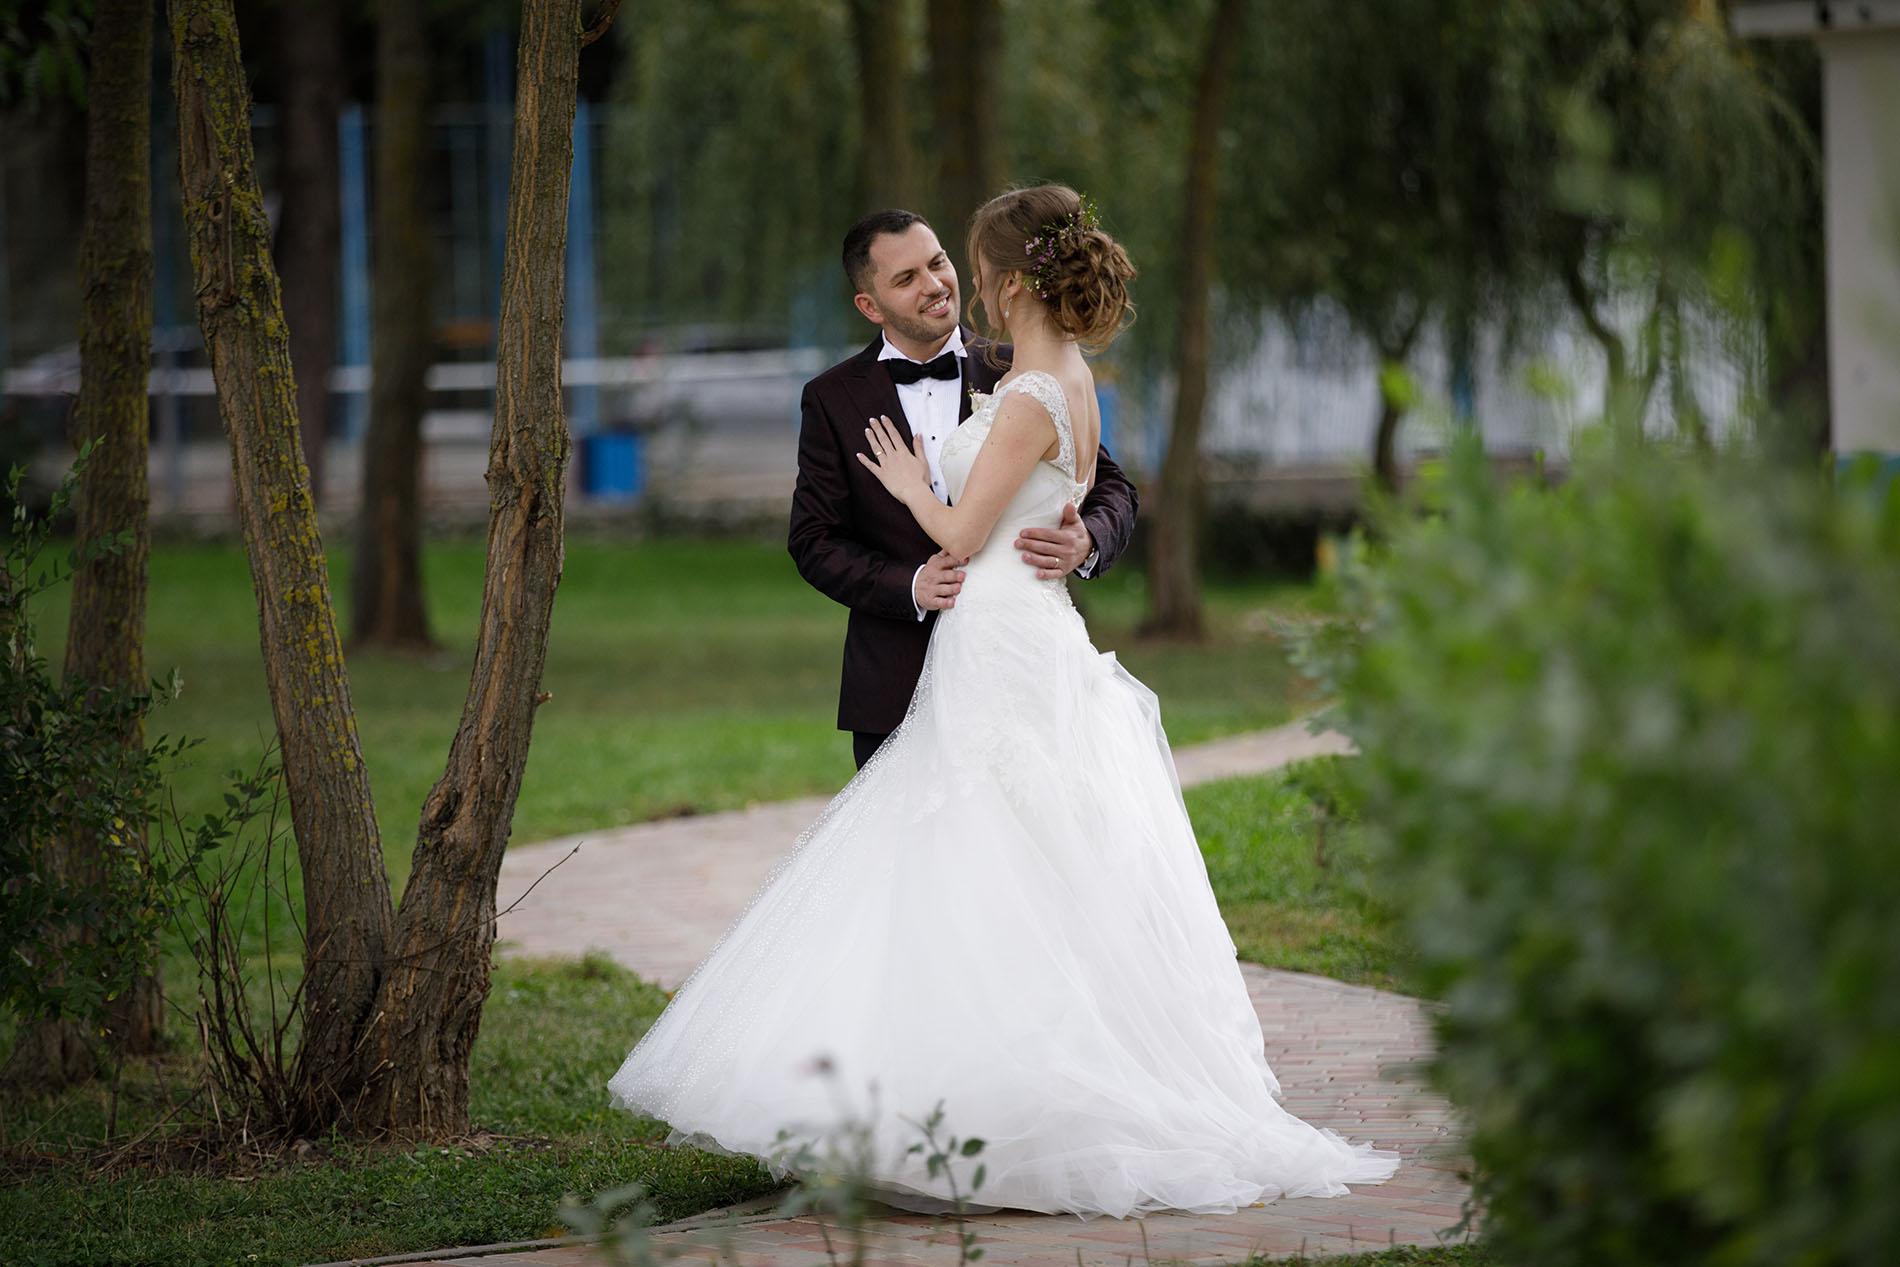 sedinta foto, wedding day